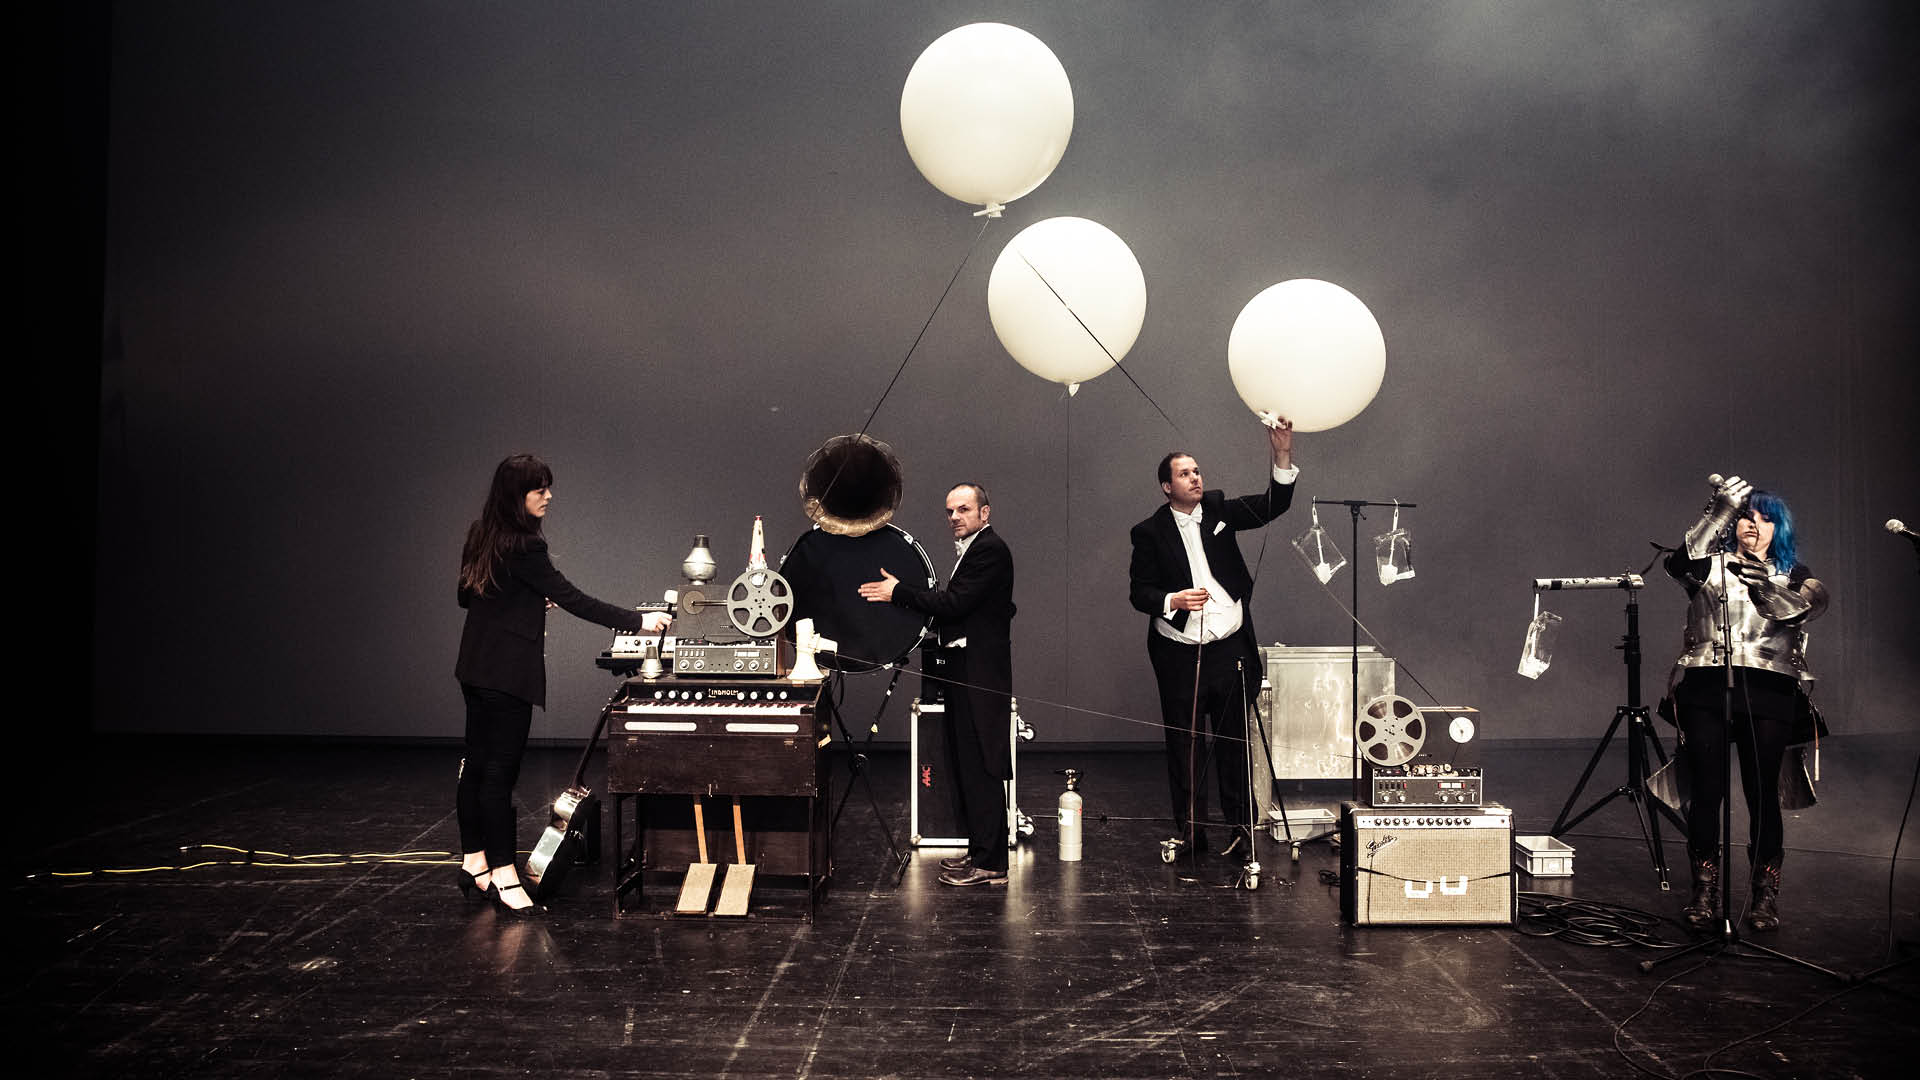 Unusual Weather Phenomena Project - Nanterre-Amandiers